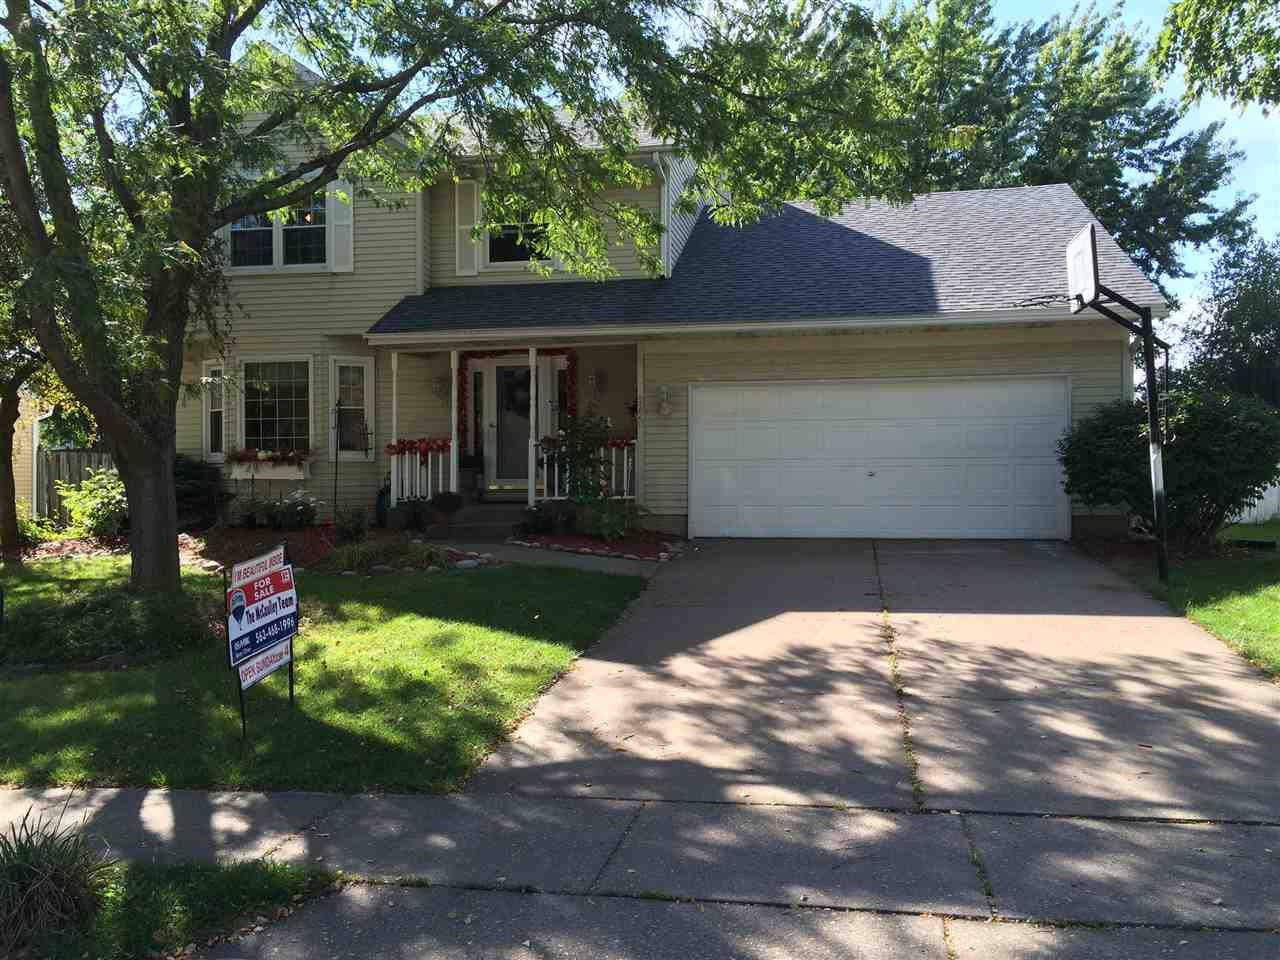 Real Estate for Sale, ListingId: 35487140, Davenport,IA52807